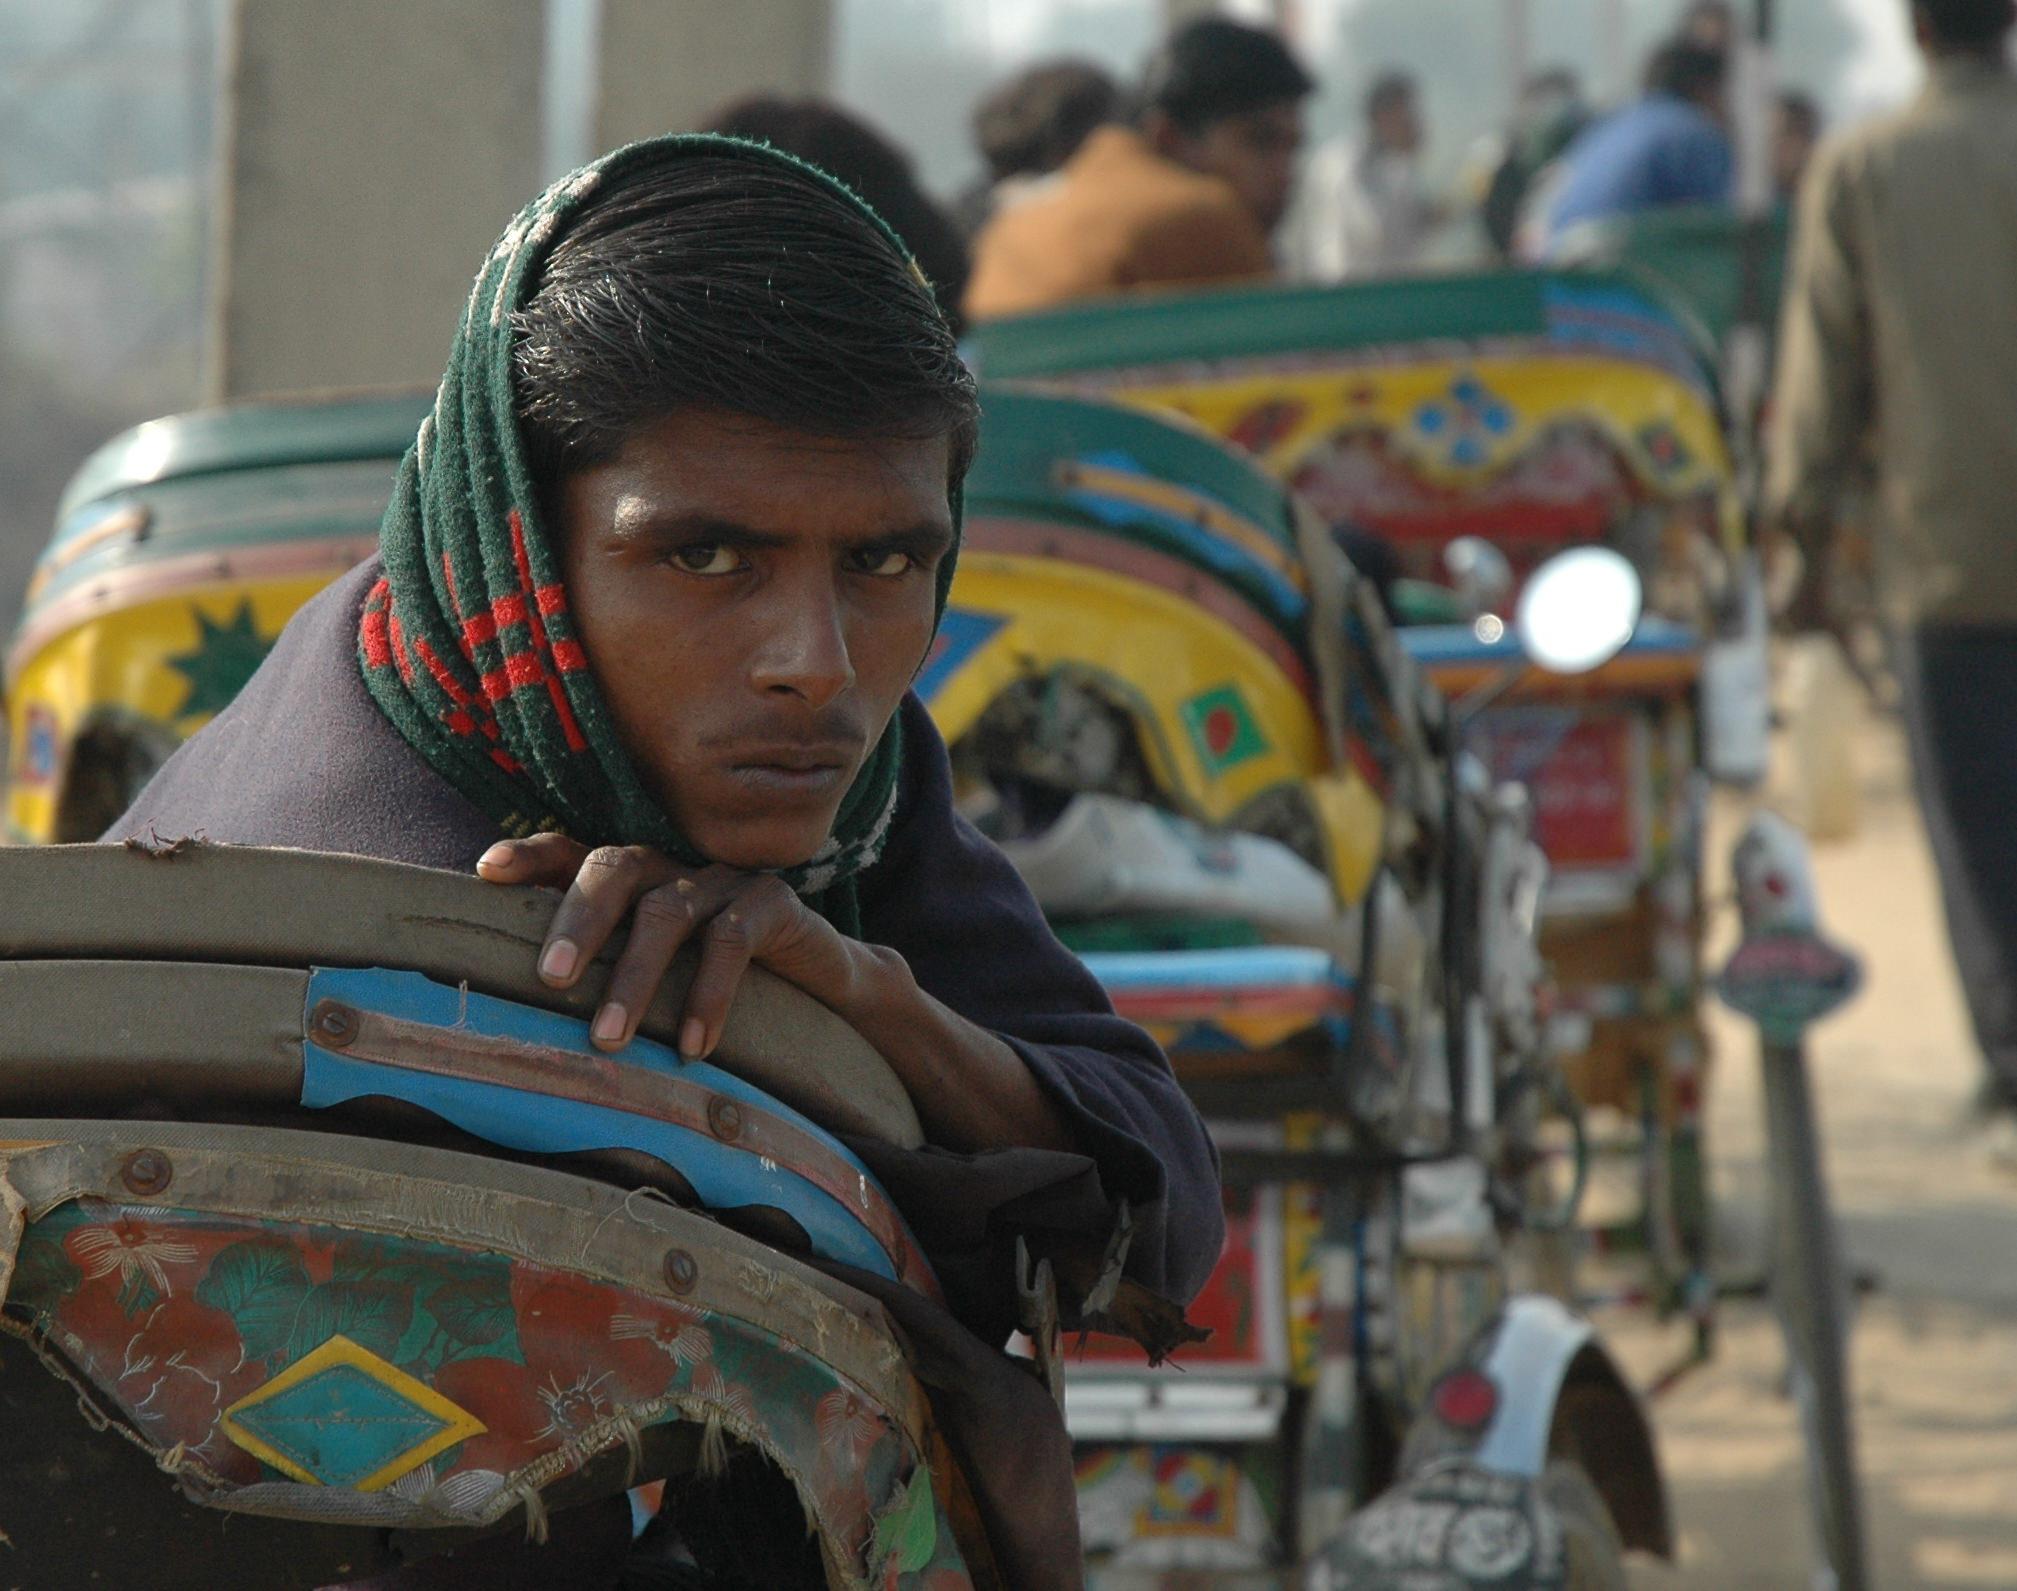 An Indian rickshaw driver waits for work. Photo courtesy of Pastalane.